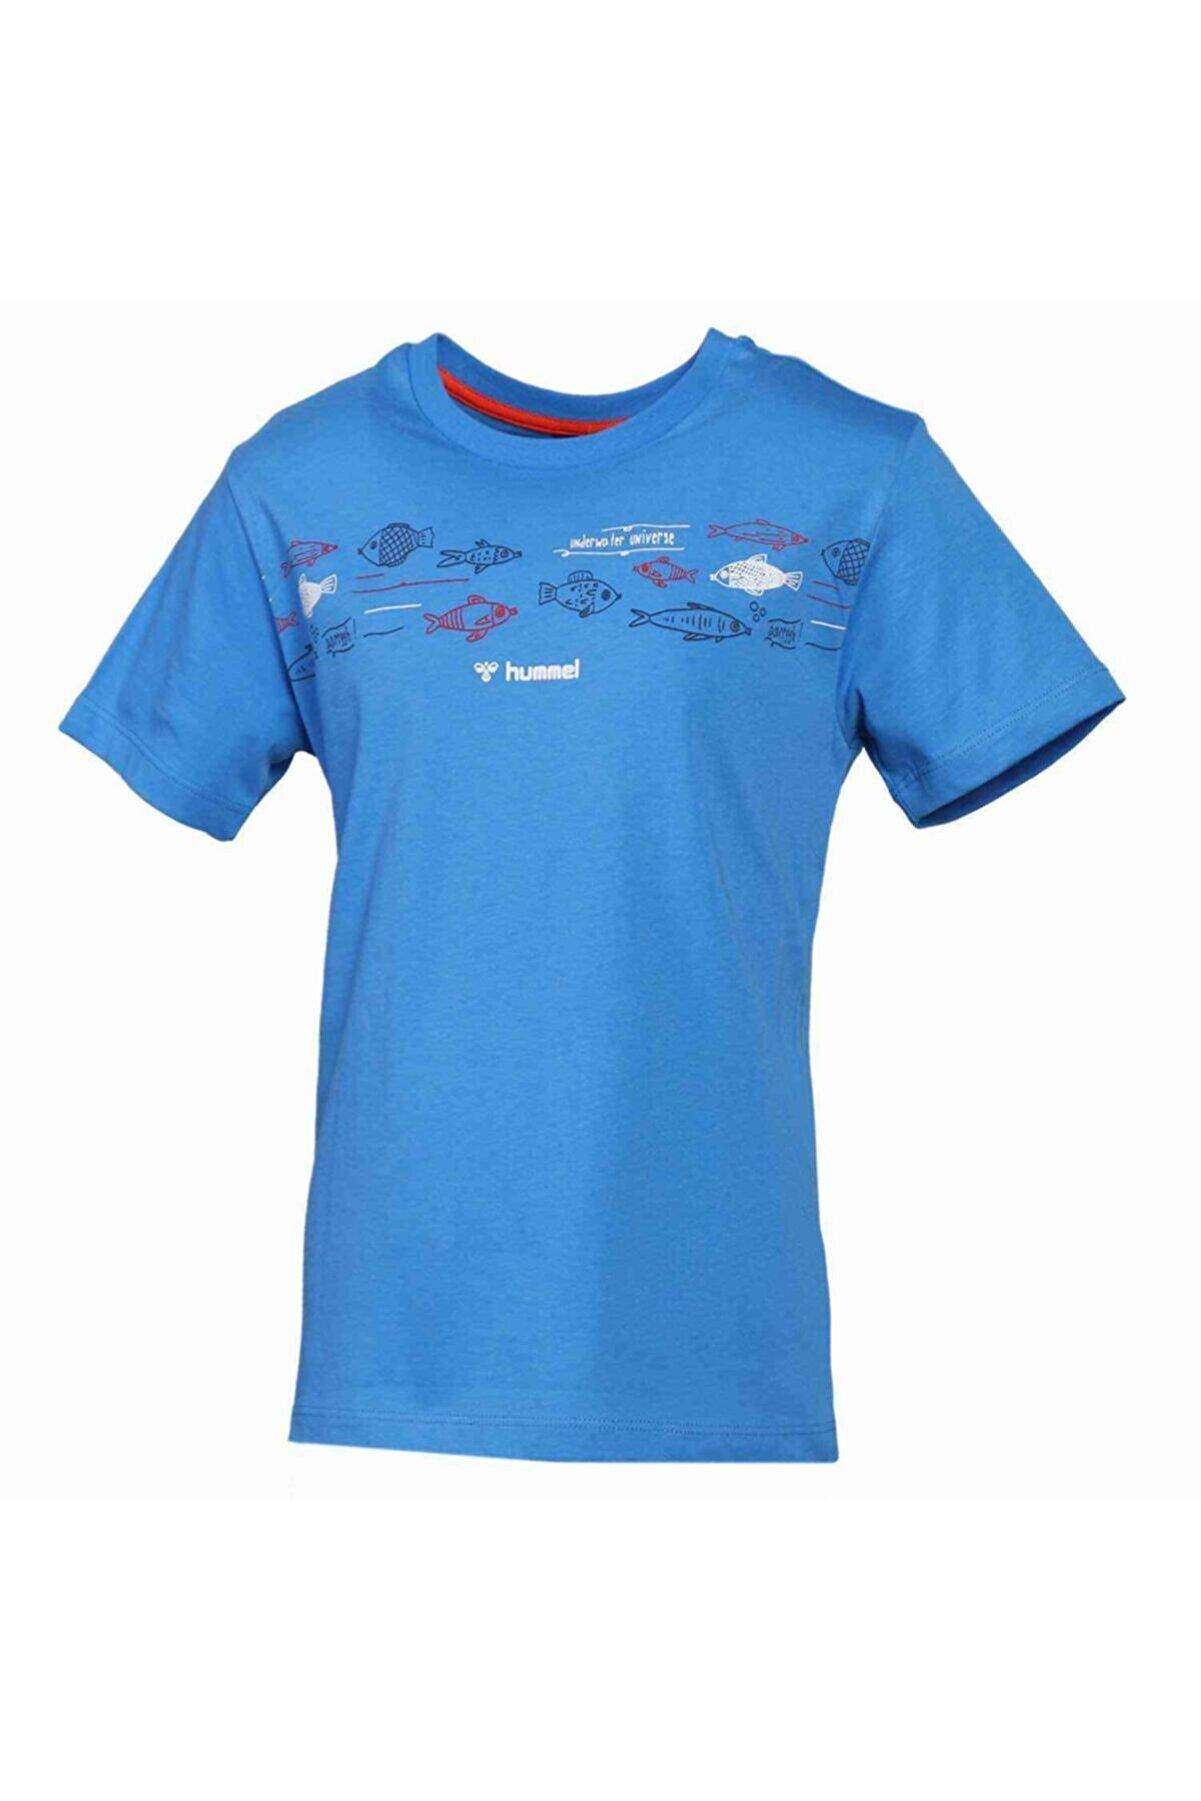 HUMMEL HMLSAILOR Mavi Erkek Çocuk T-Shirt 101085859